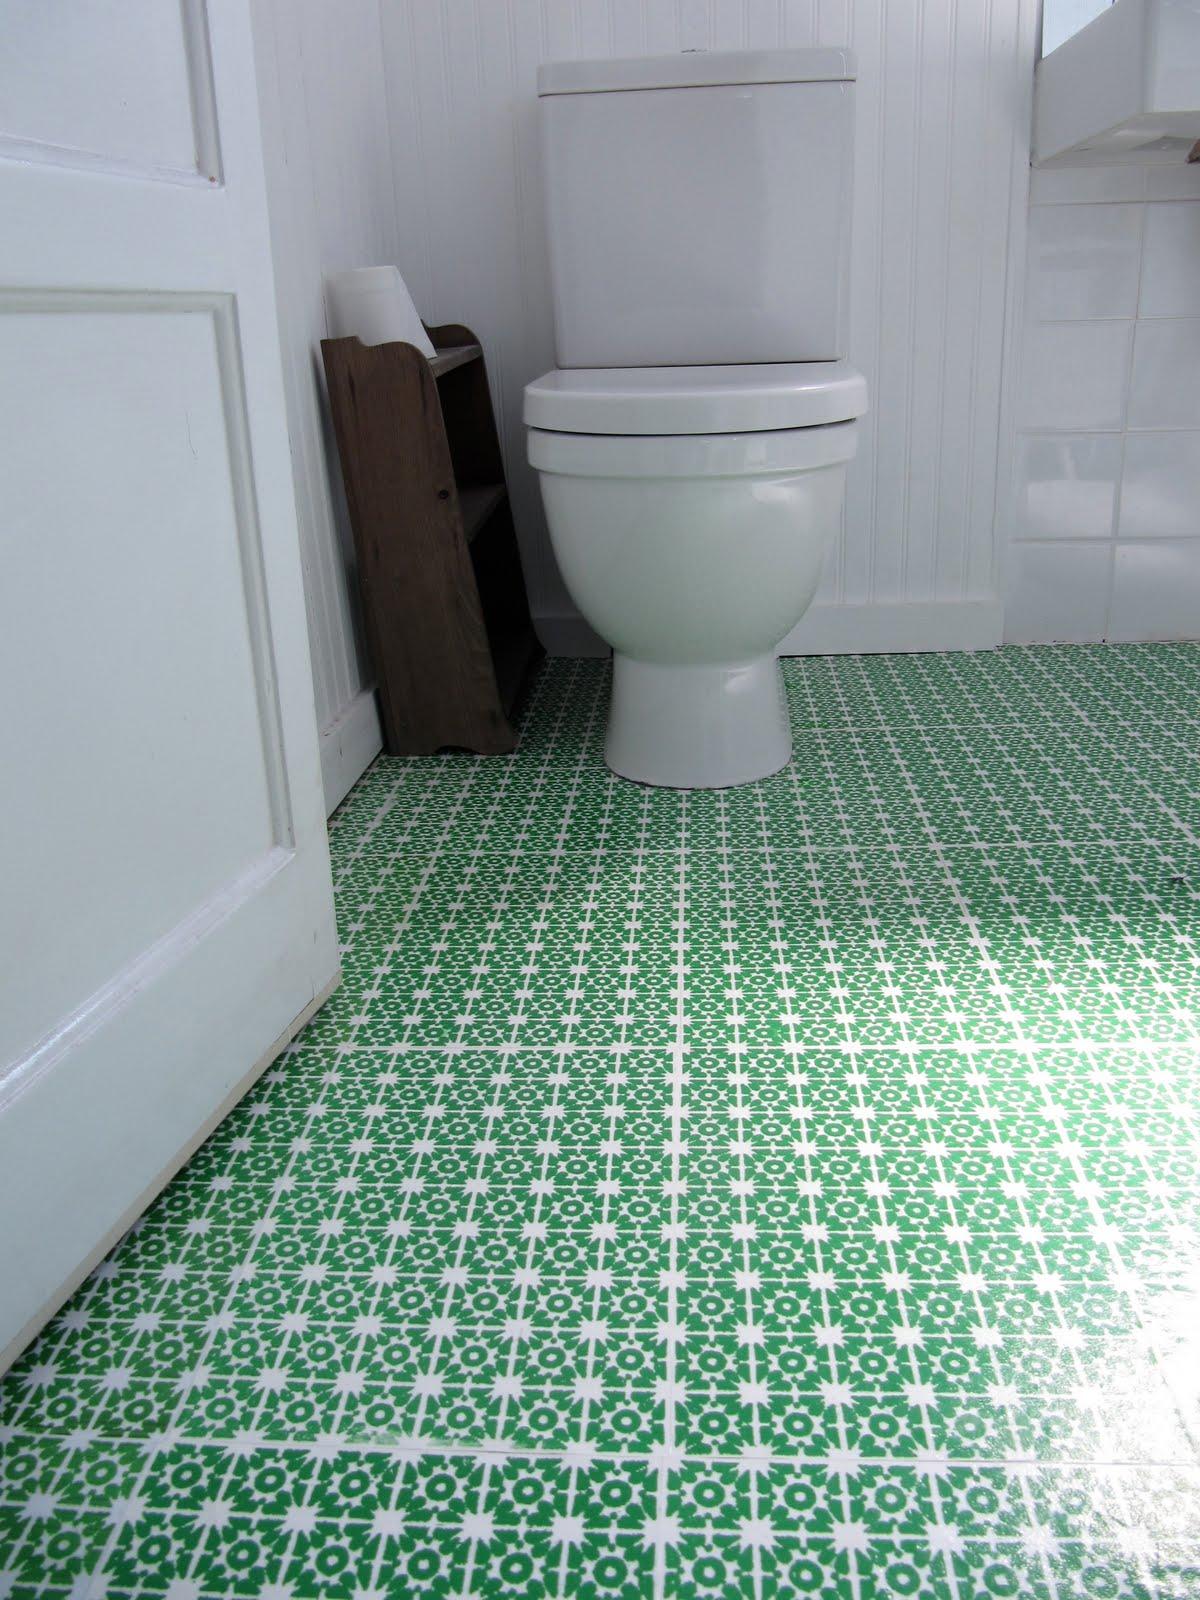 green wallpaper flooring in a bathroom